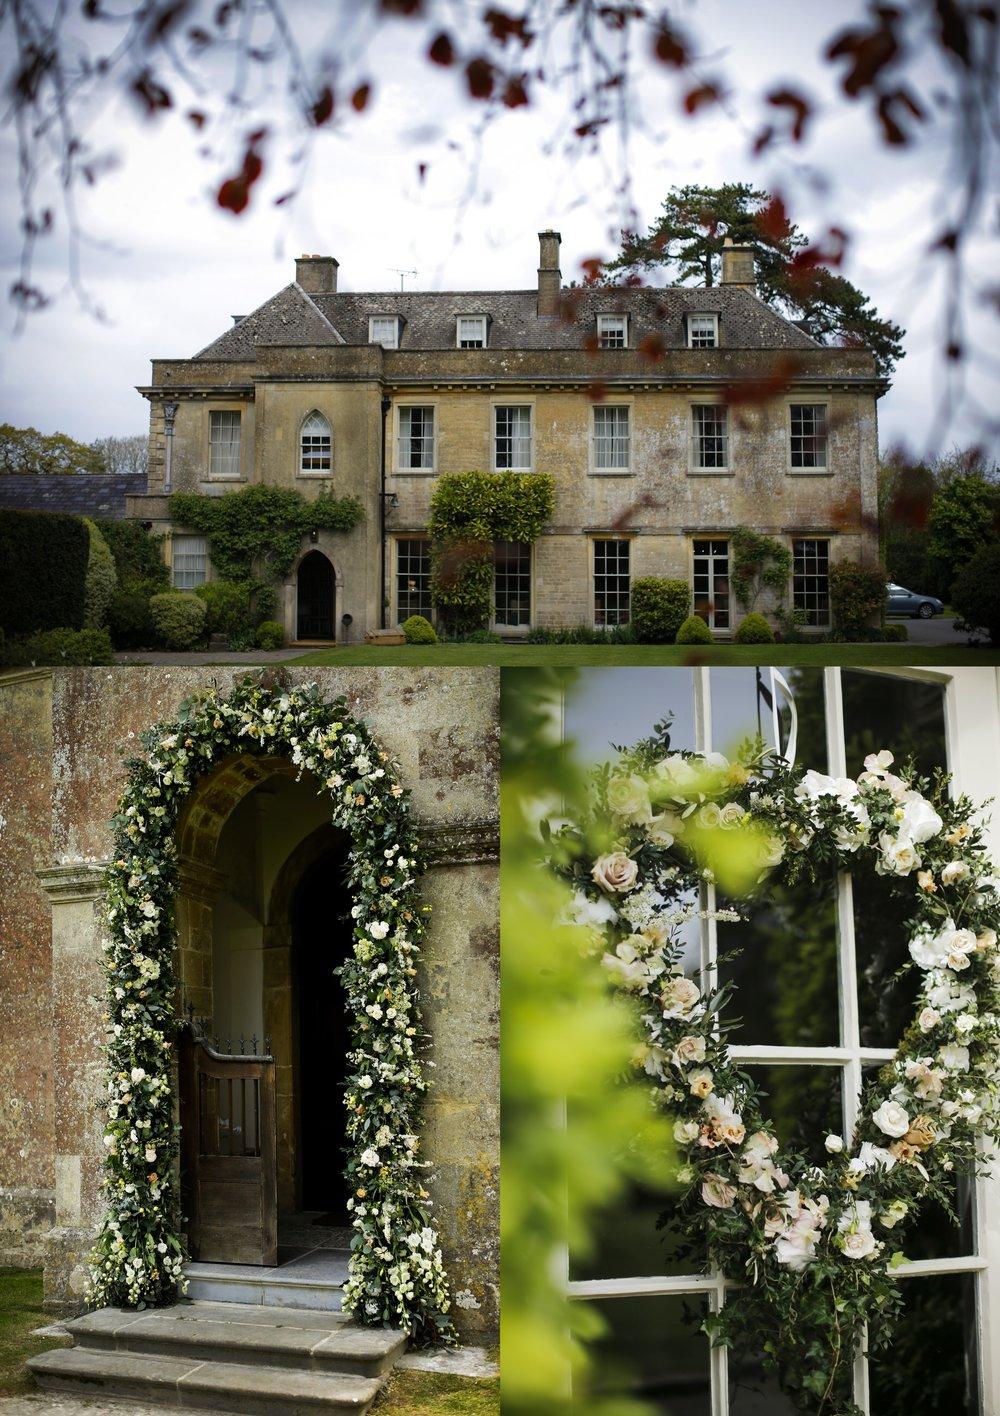 babington-house-wedding-at-soho-house-london-wedding-photographer_0001.jpg